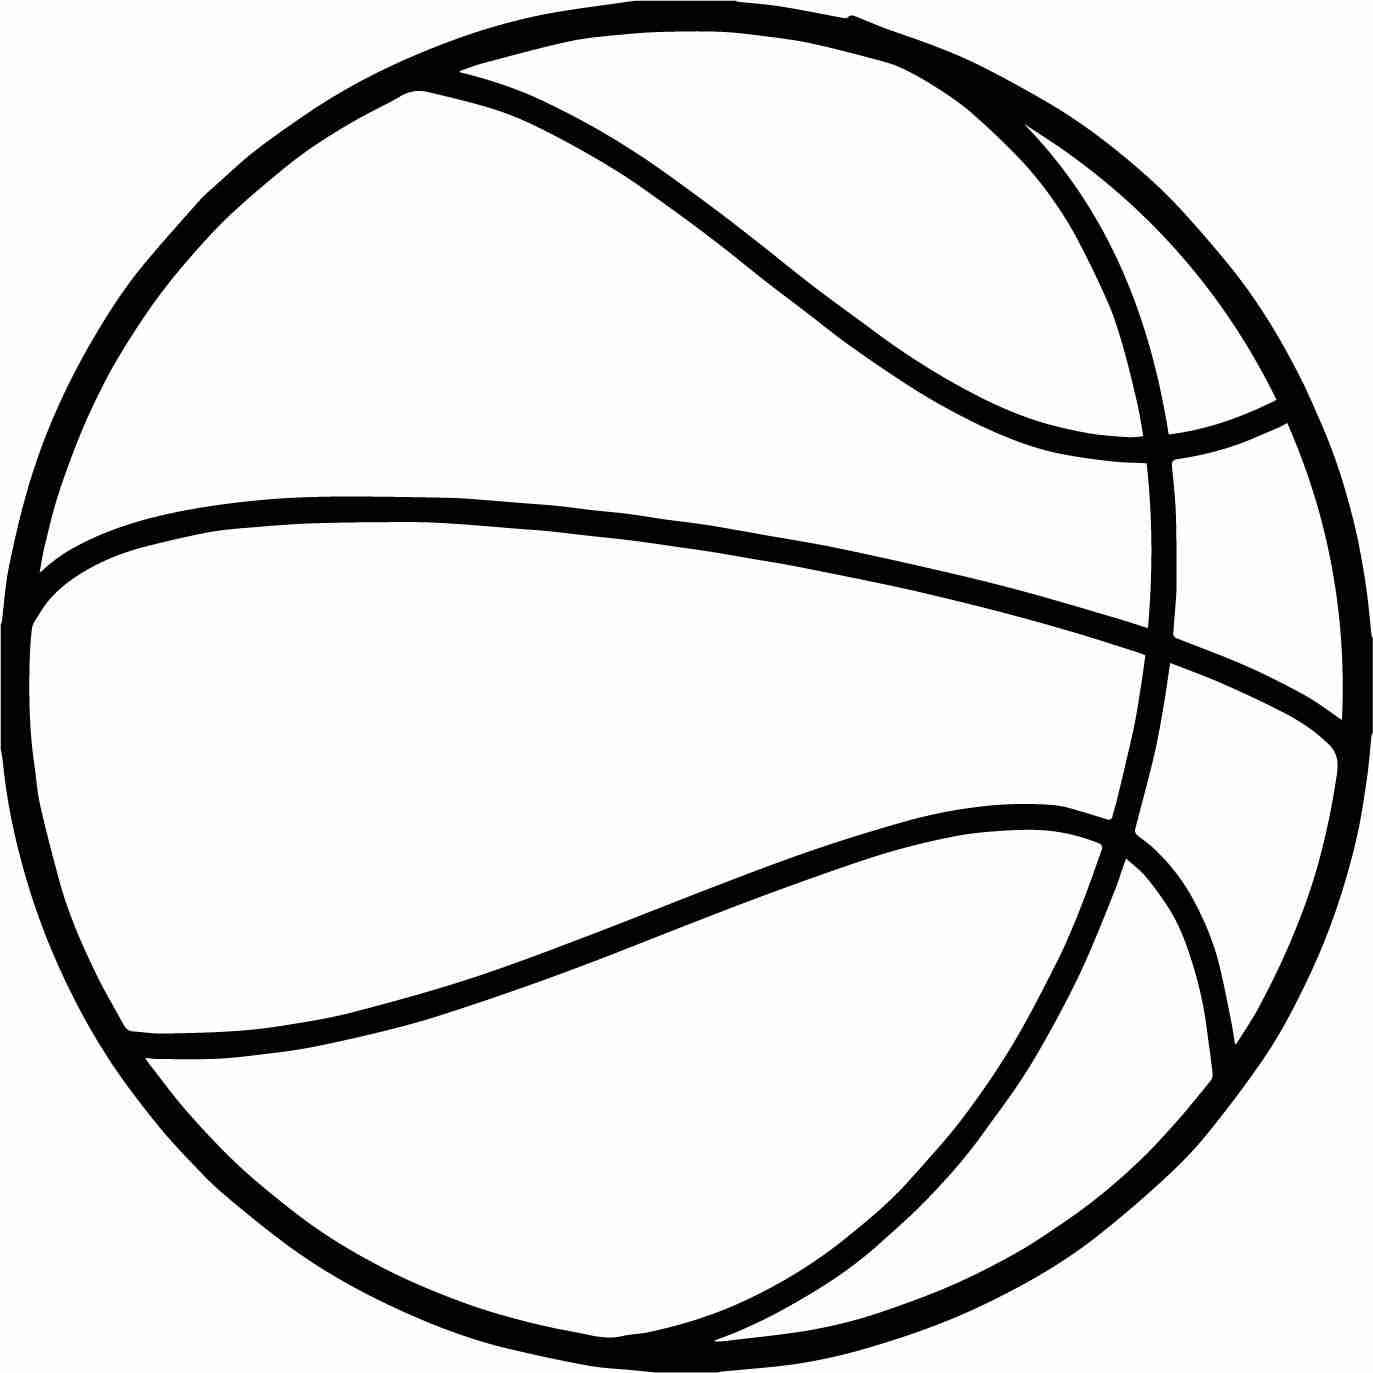 1373x1373 Fine Basketball Ball Coloring Page Wecoloringpage Mesmerizing